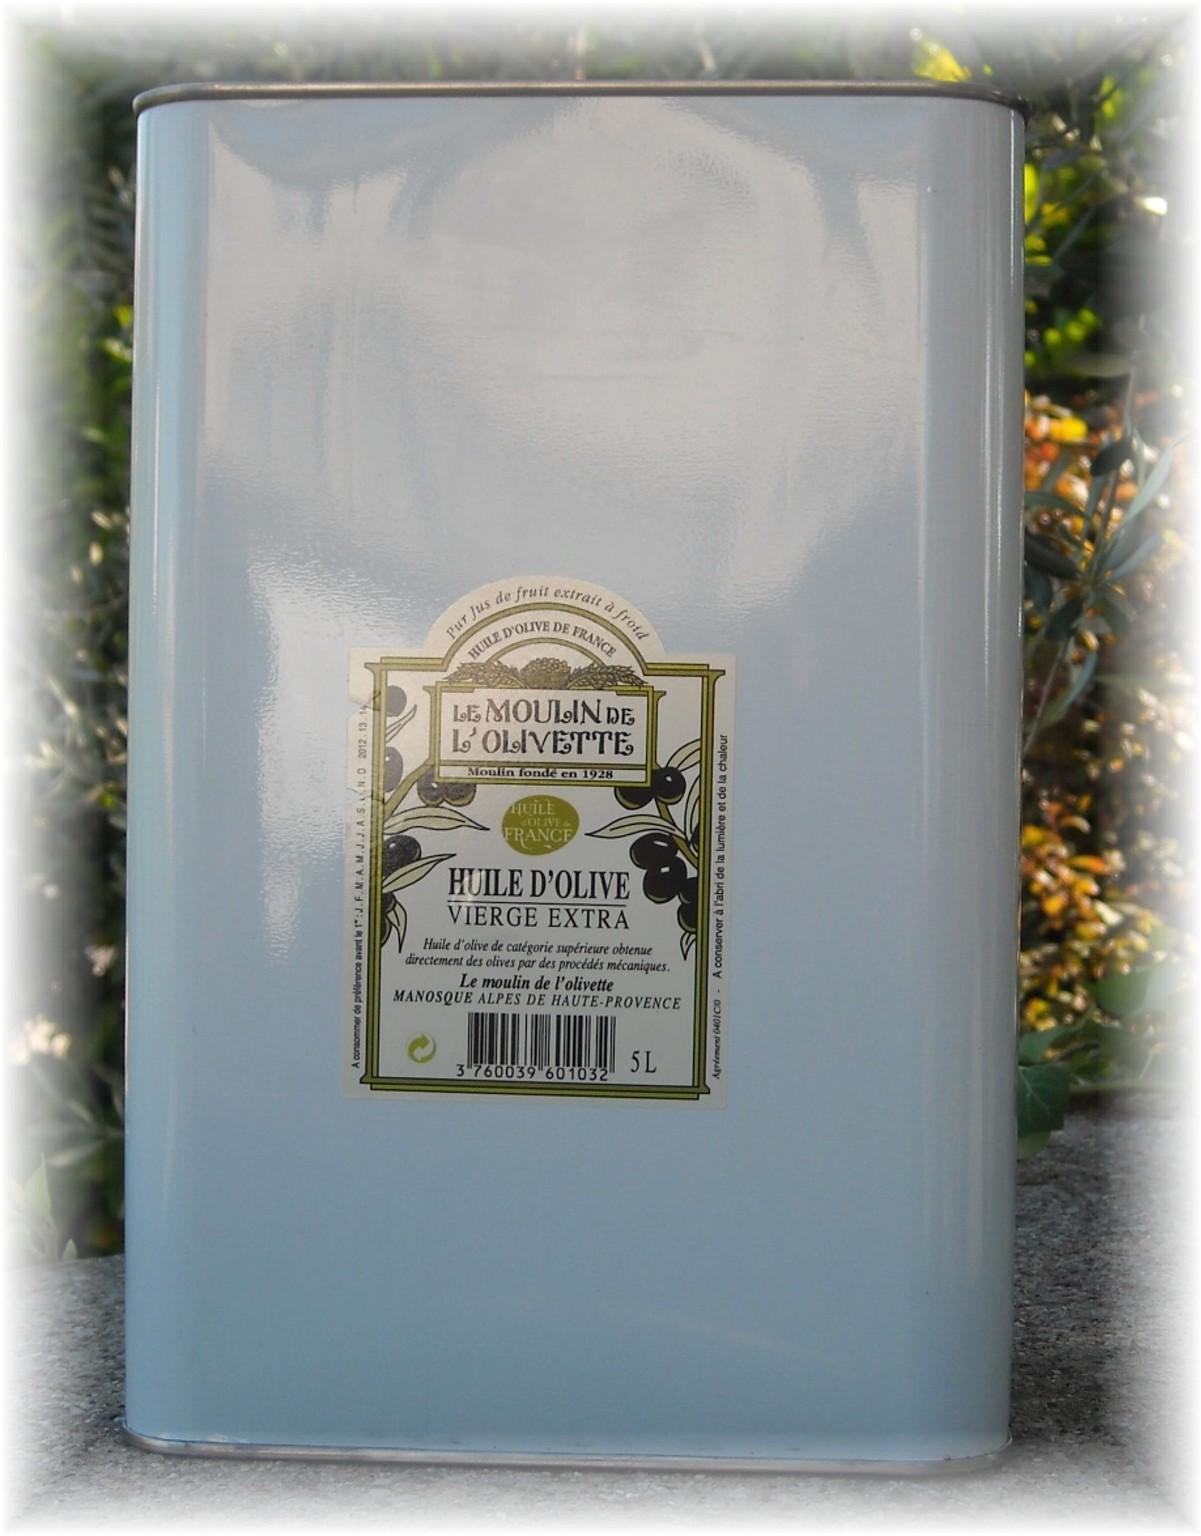 huile d 39 olive v extra du midi de la france 5l huile d 39 olive de provence aoc en vente directe. Black Bedroom Furniture Sets. Home Design Ideas